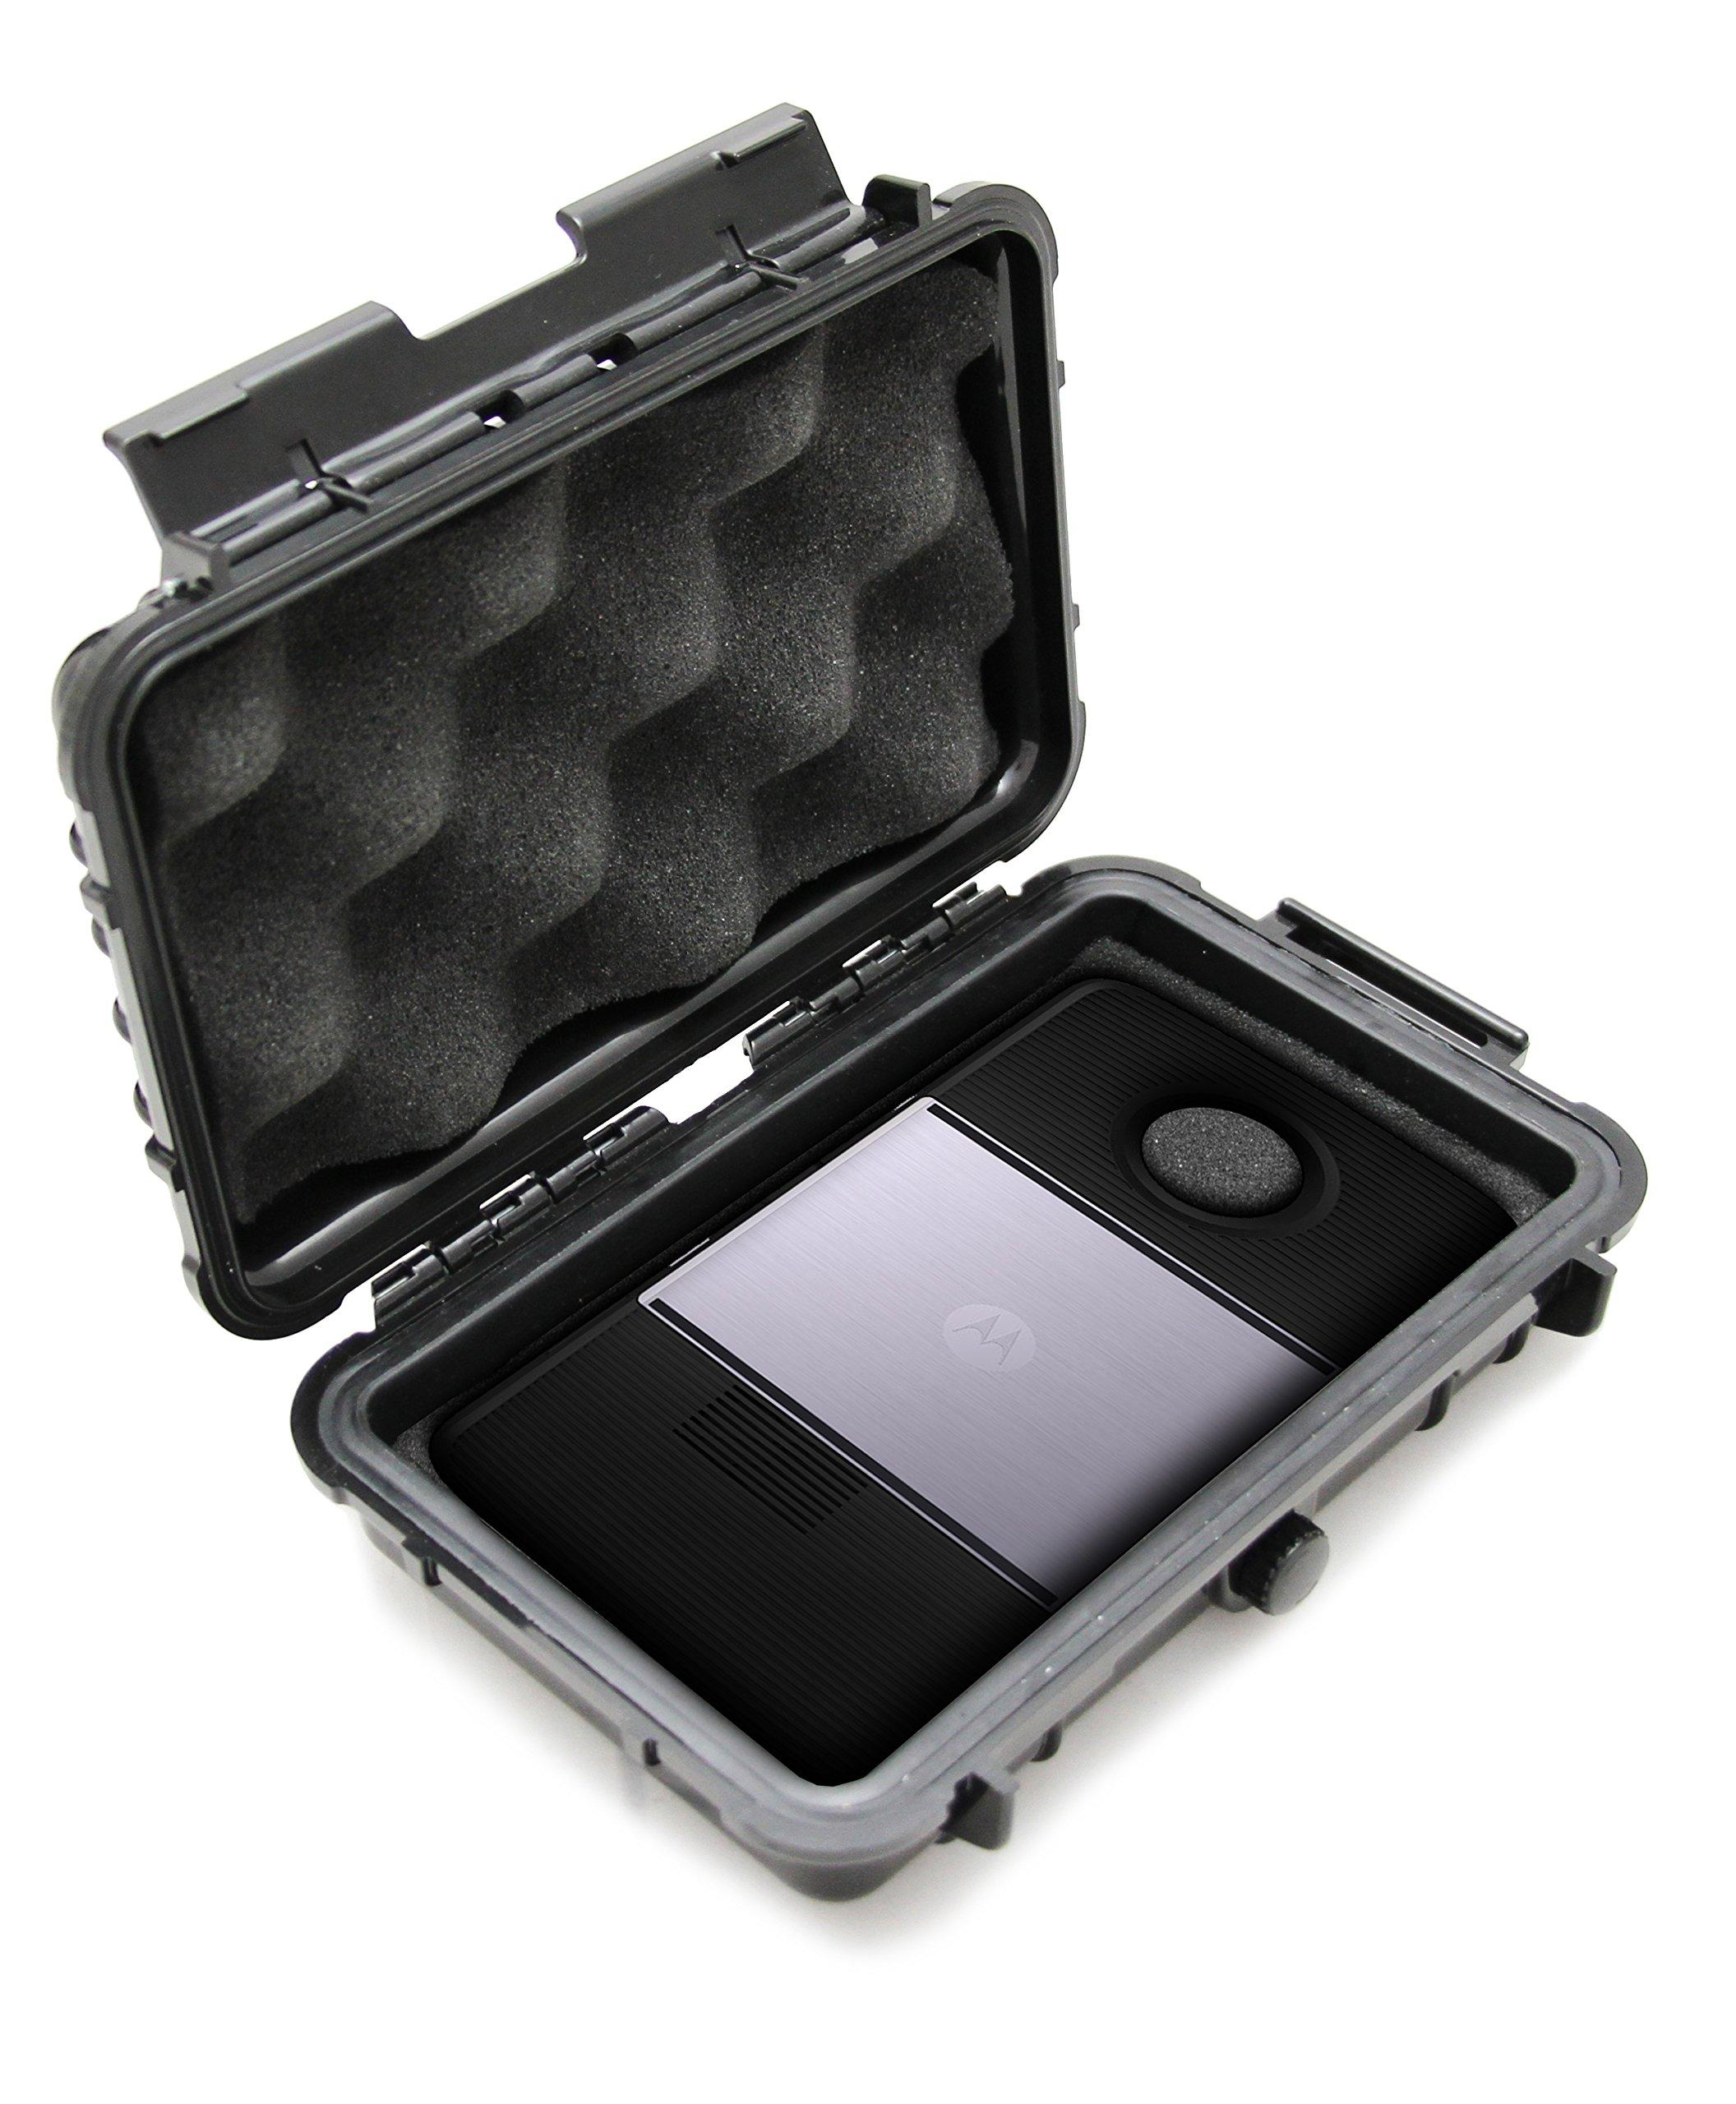 CASEMATIX Waterproof Moto Z Mod Case For Motorola Mod Hasselbad True Motion Camera , JBL SoundBoost Speaker , Insta-Share Projector , Smart Speaker With Amazon Alexa , Polaroid Insta-Share printer